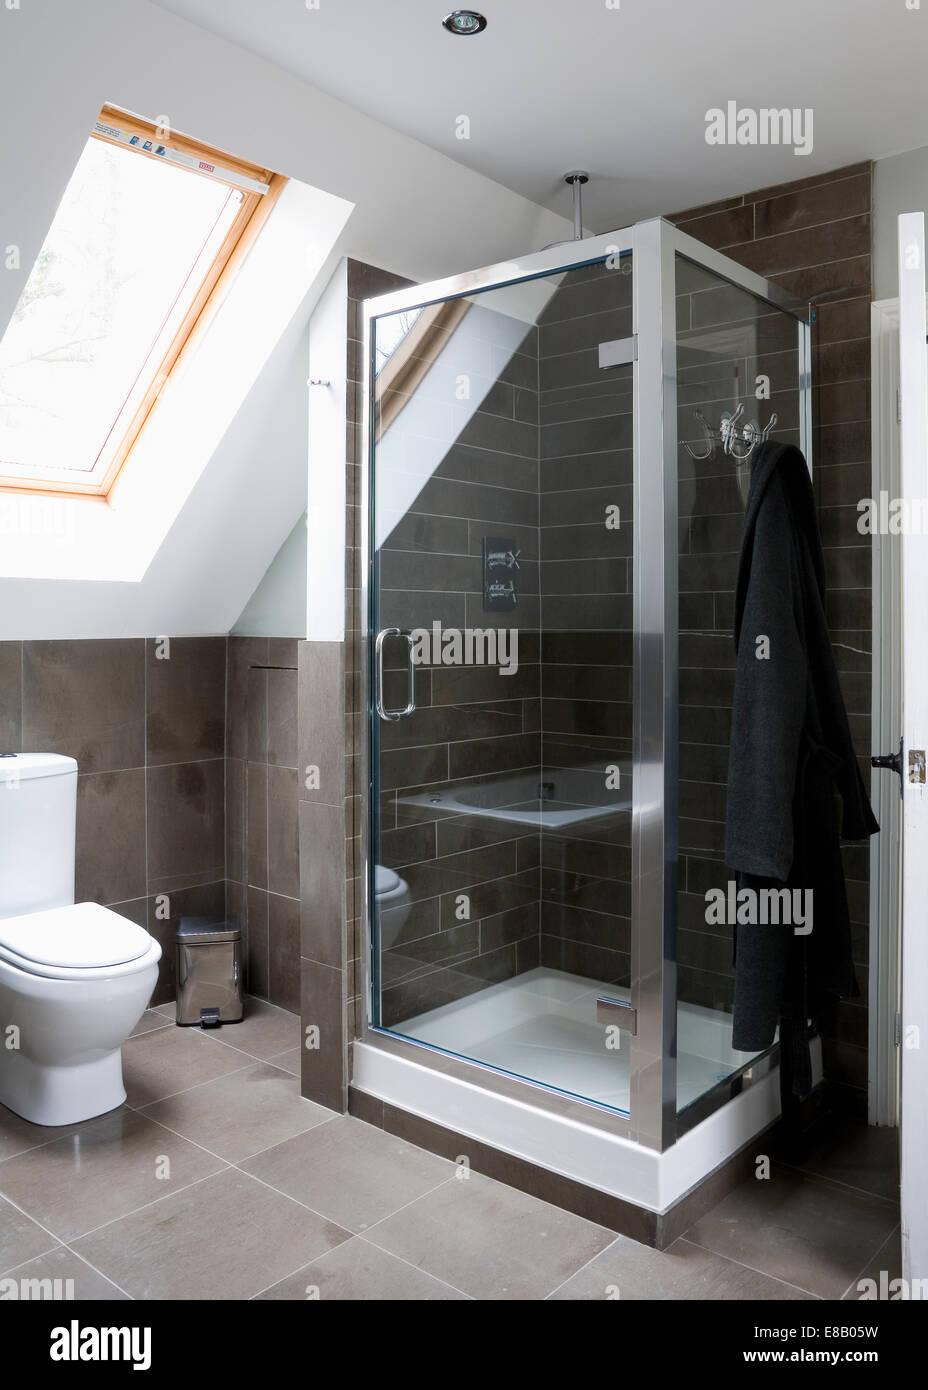 Modern Loft modern loft conversion shower room stock photo, royalty free image